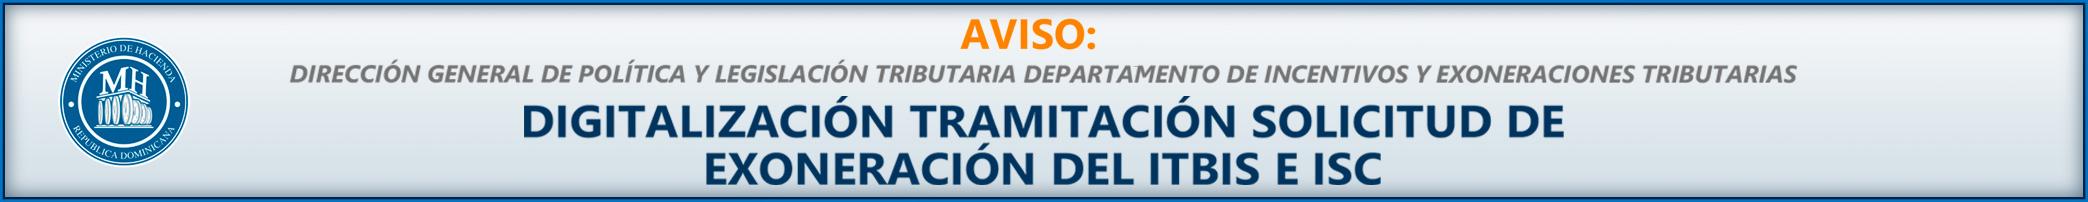 Aviso digitalizacion banner